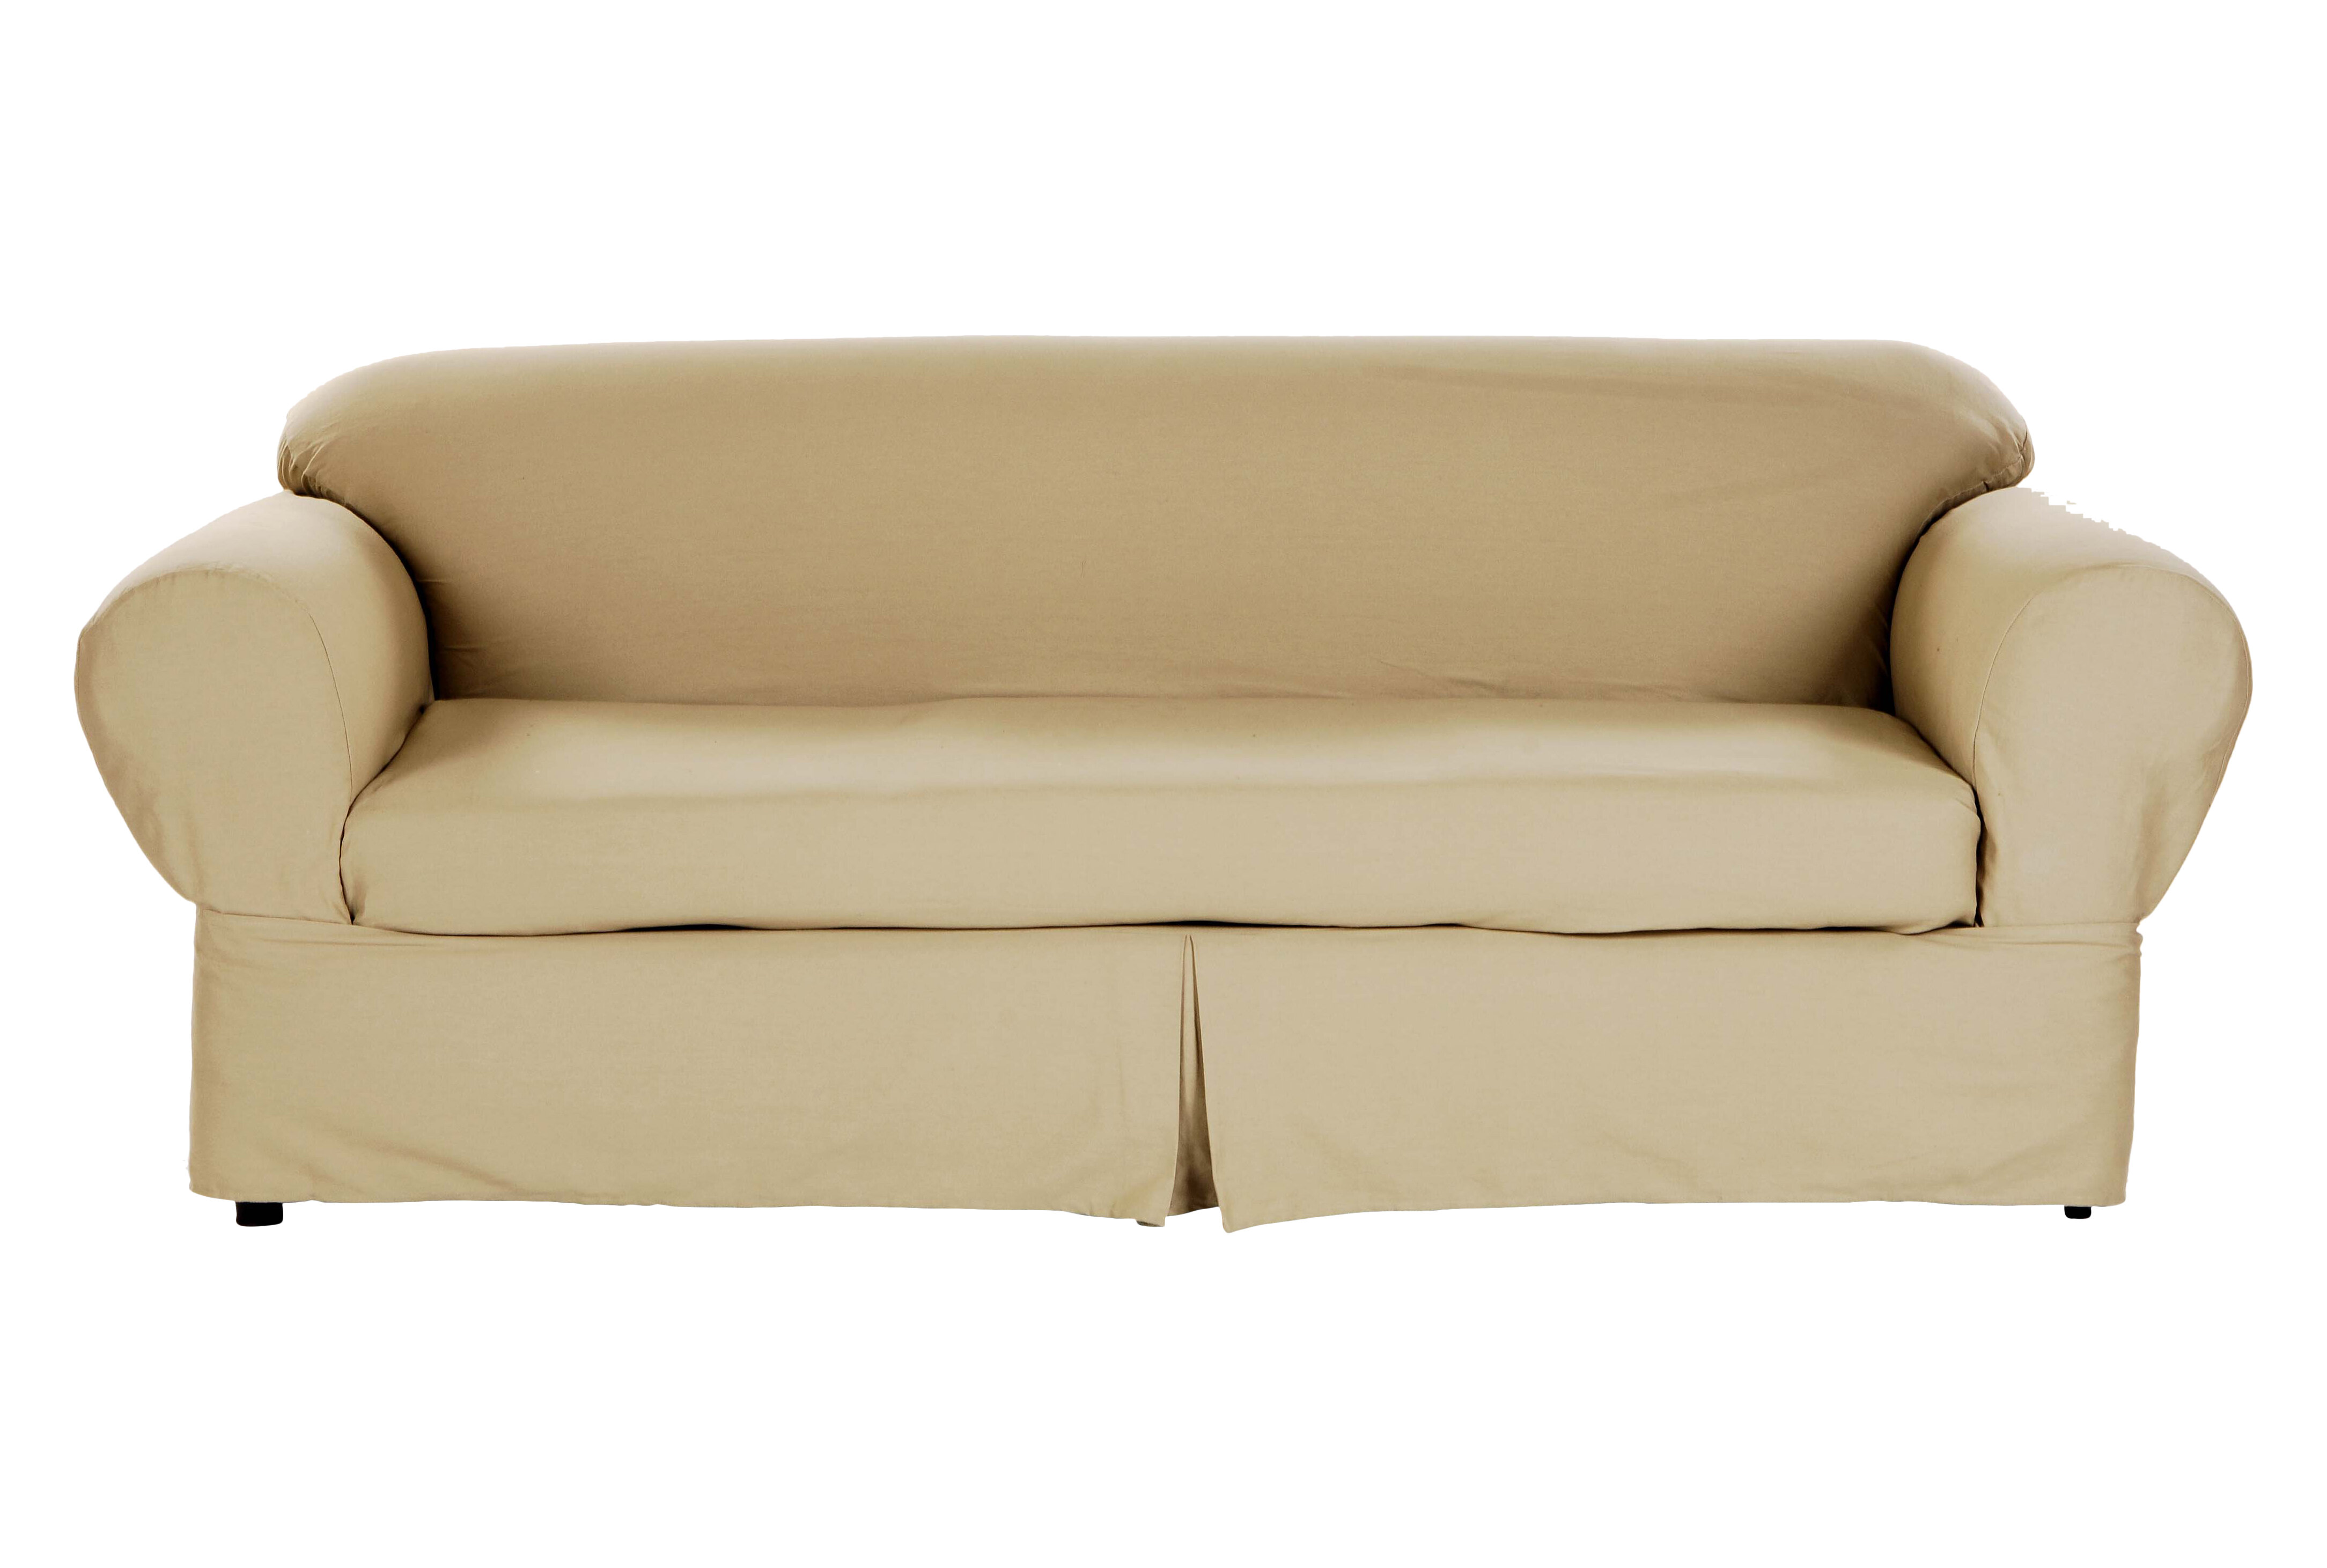 Darby Home Co Box Cushion Loveseat Slipcover Reviews Wayfair